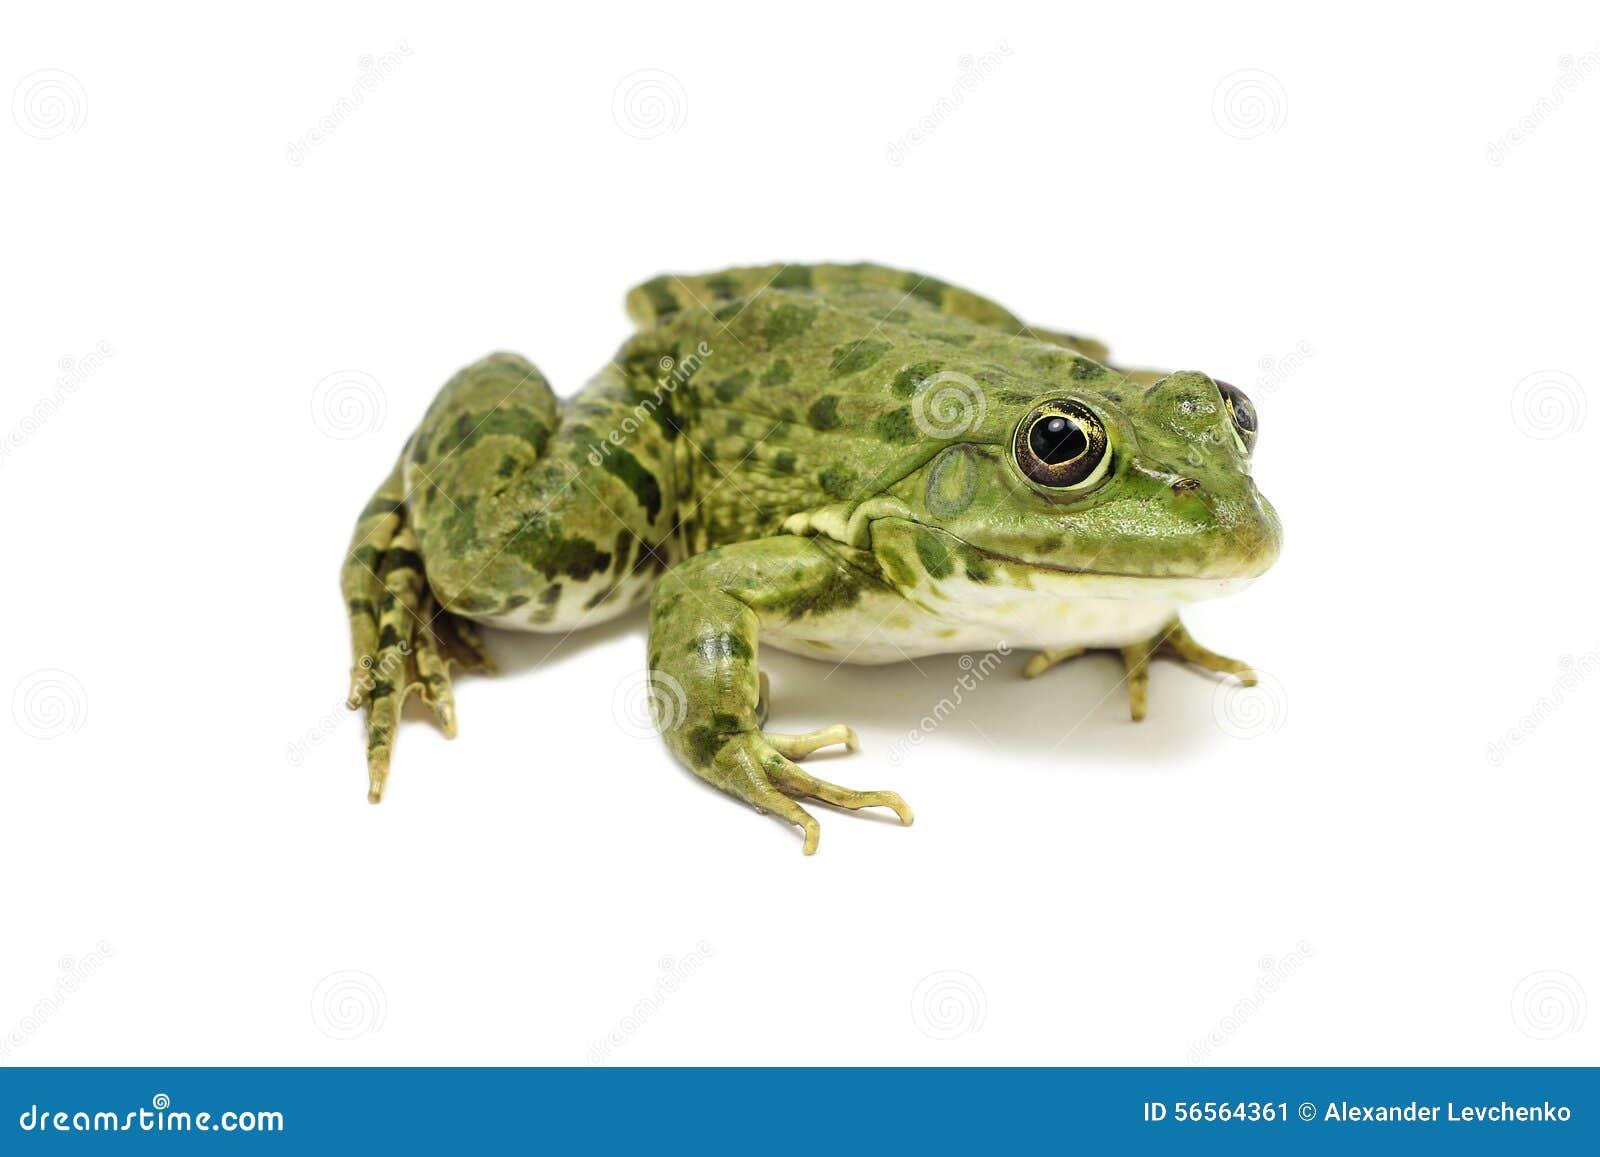 Download Ανοικτό πράσινο βάτραχος στοκ εικόνα. εικόνα από έξυπνο - 56564361